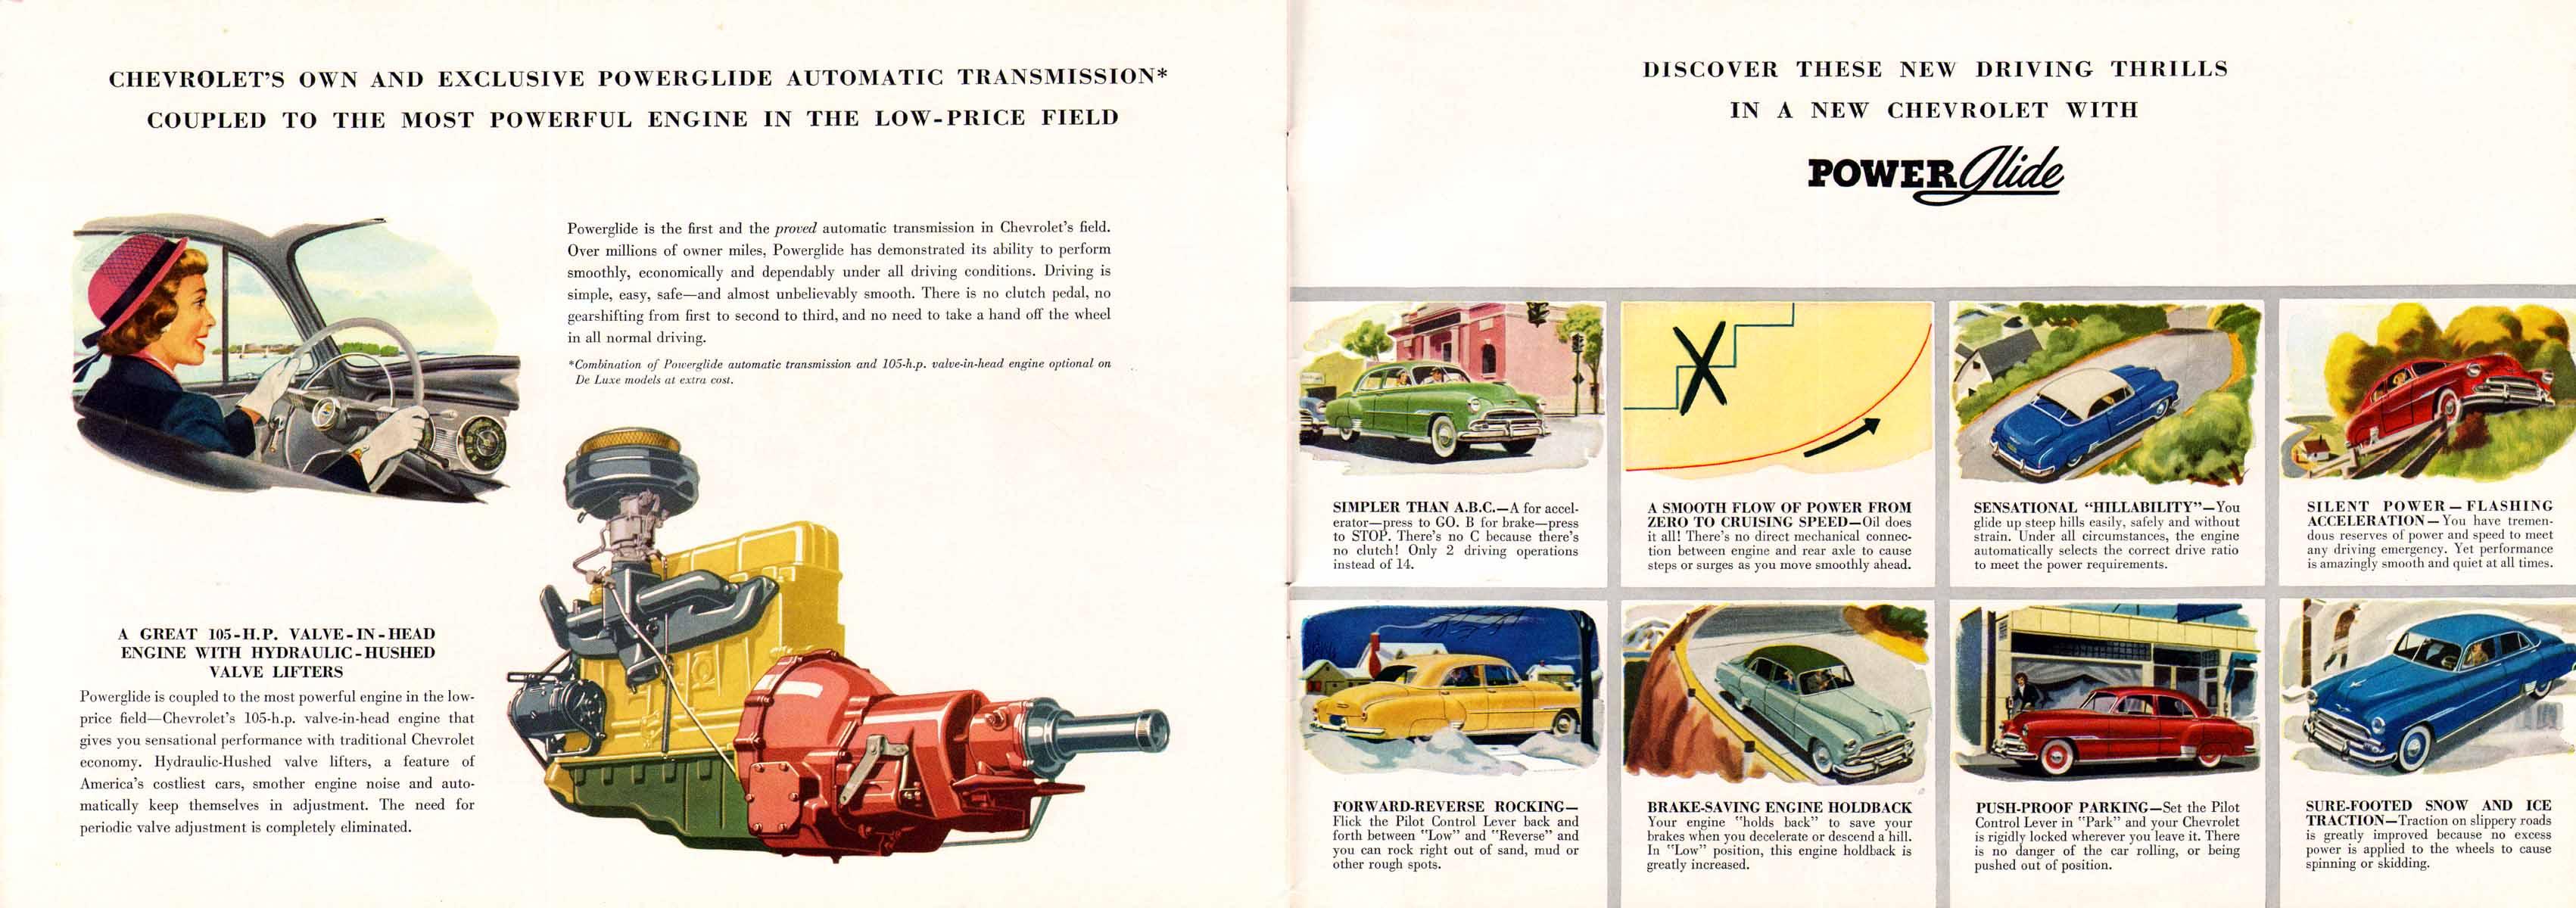 1951 Chevrolet Fulll Line Brochure